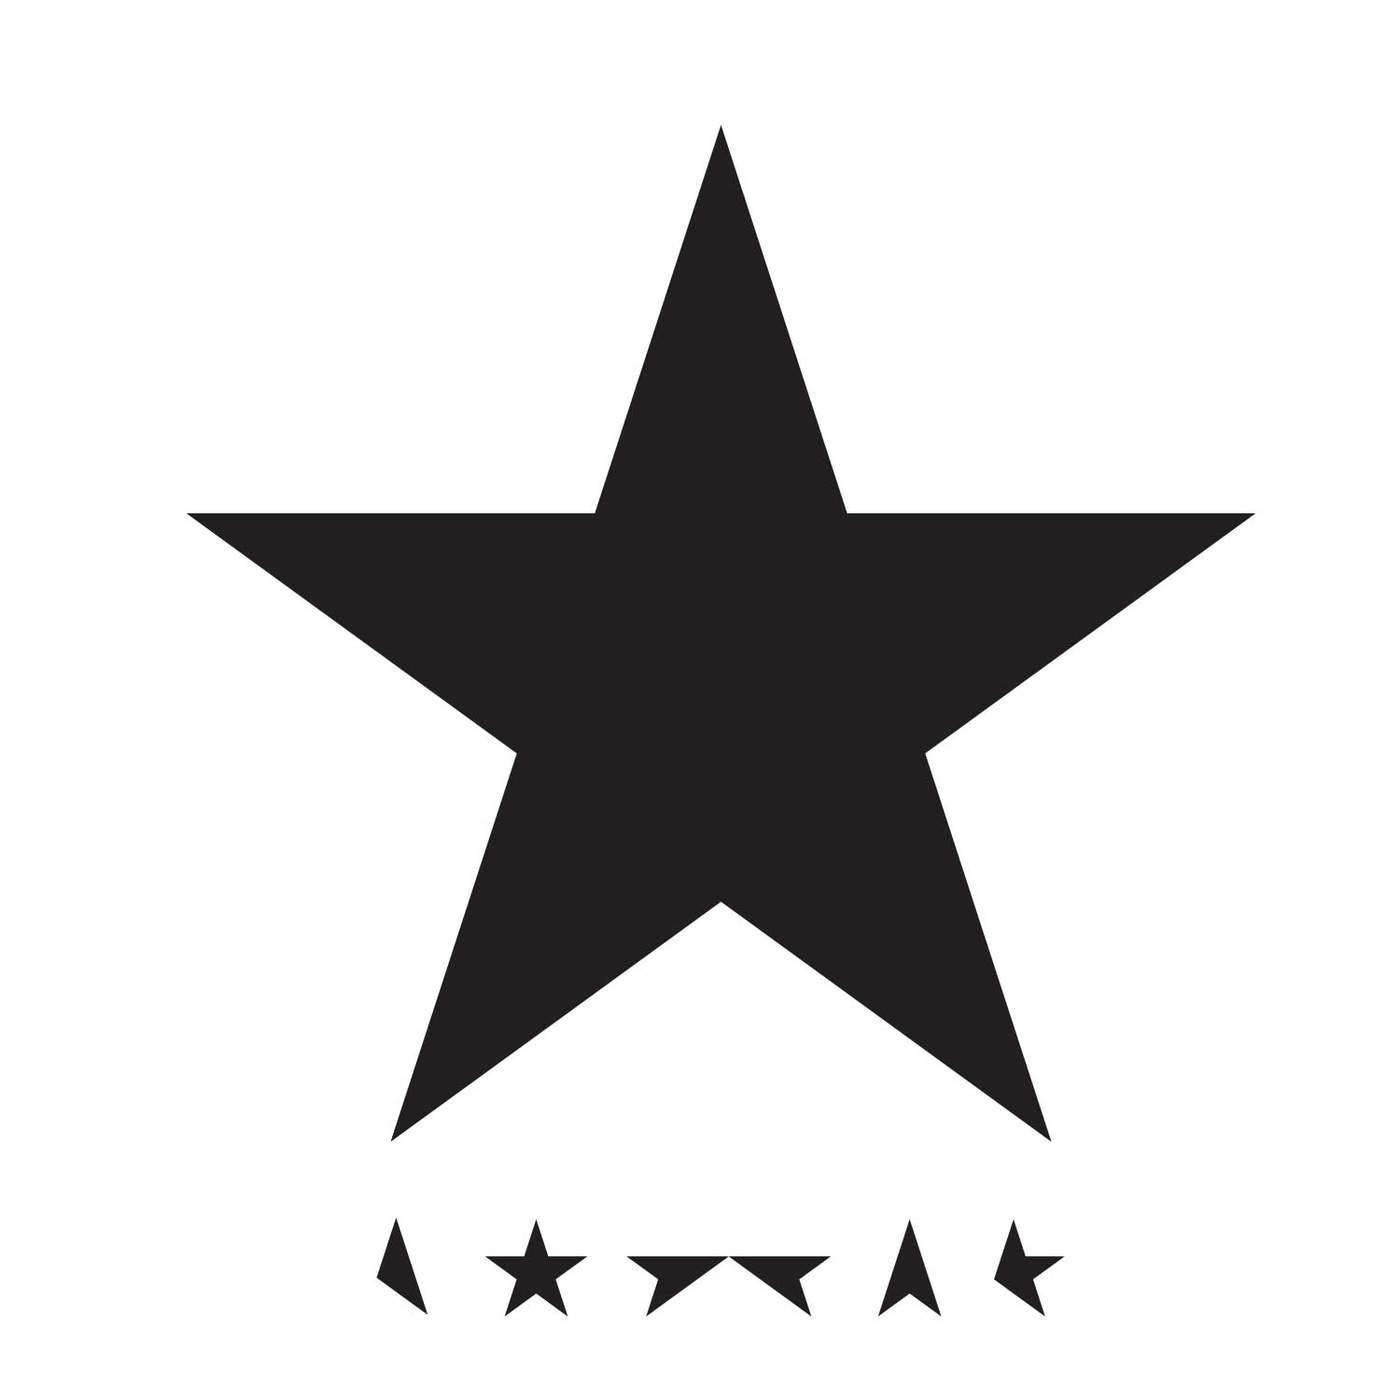 David Bowie - Blackstar Cover